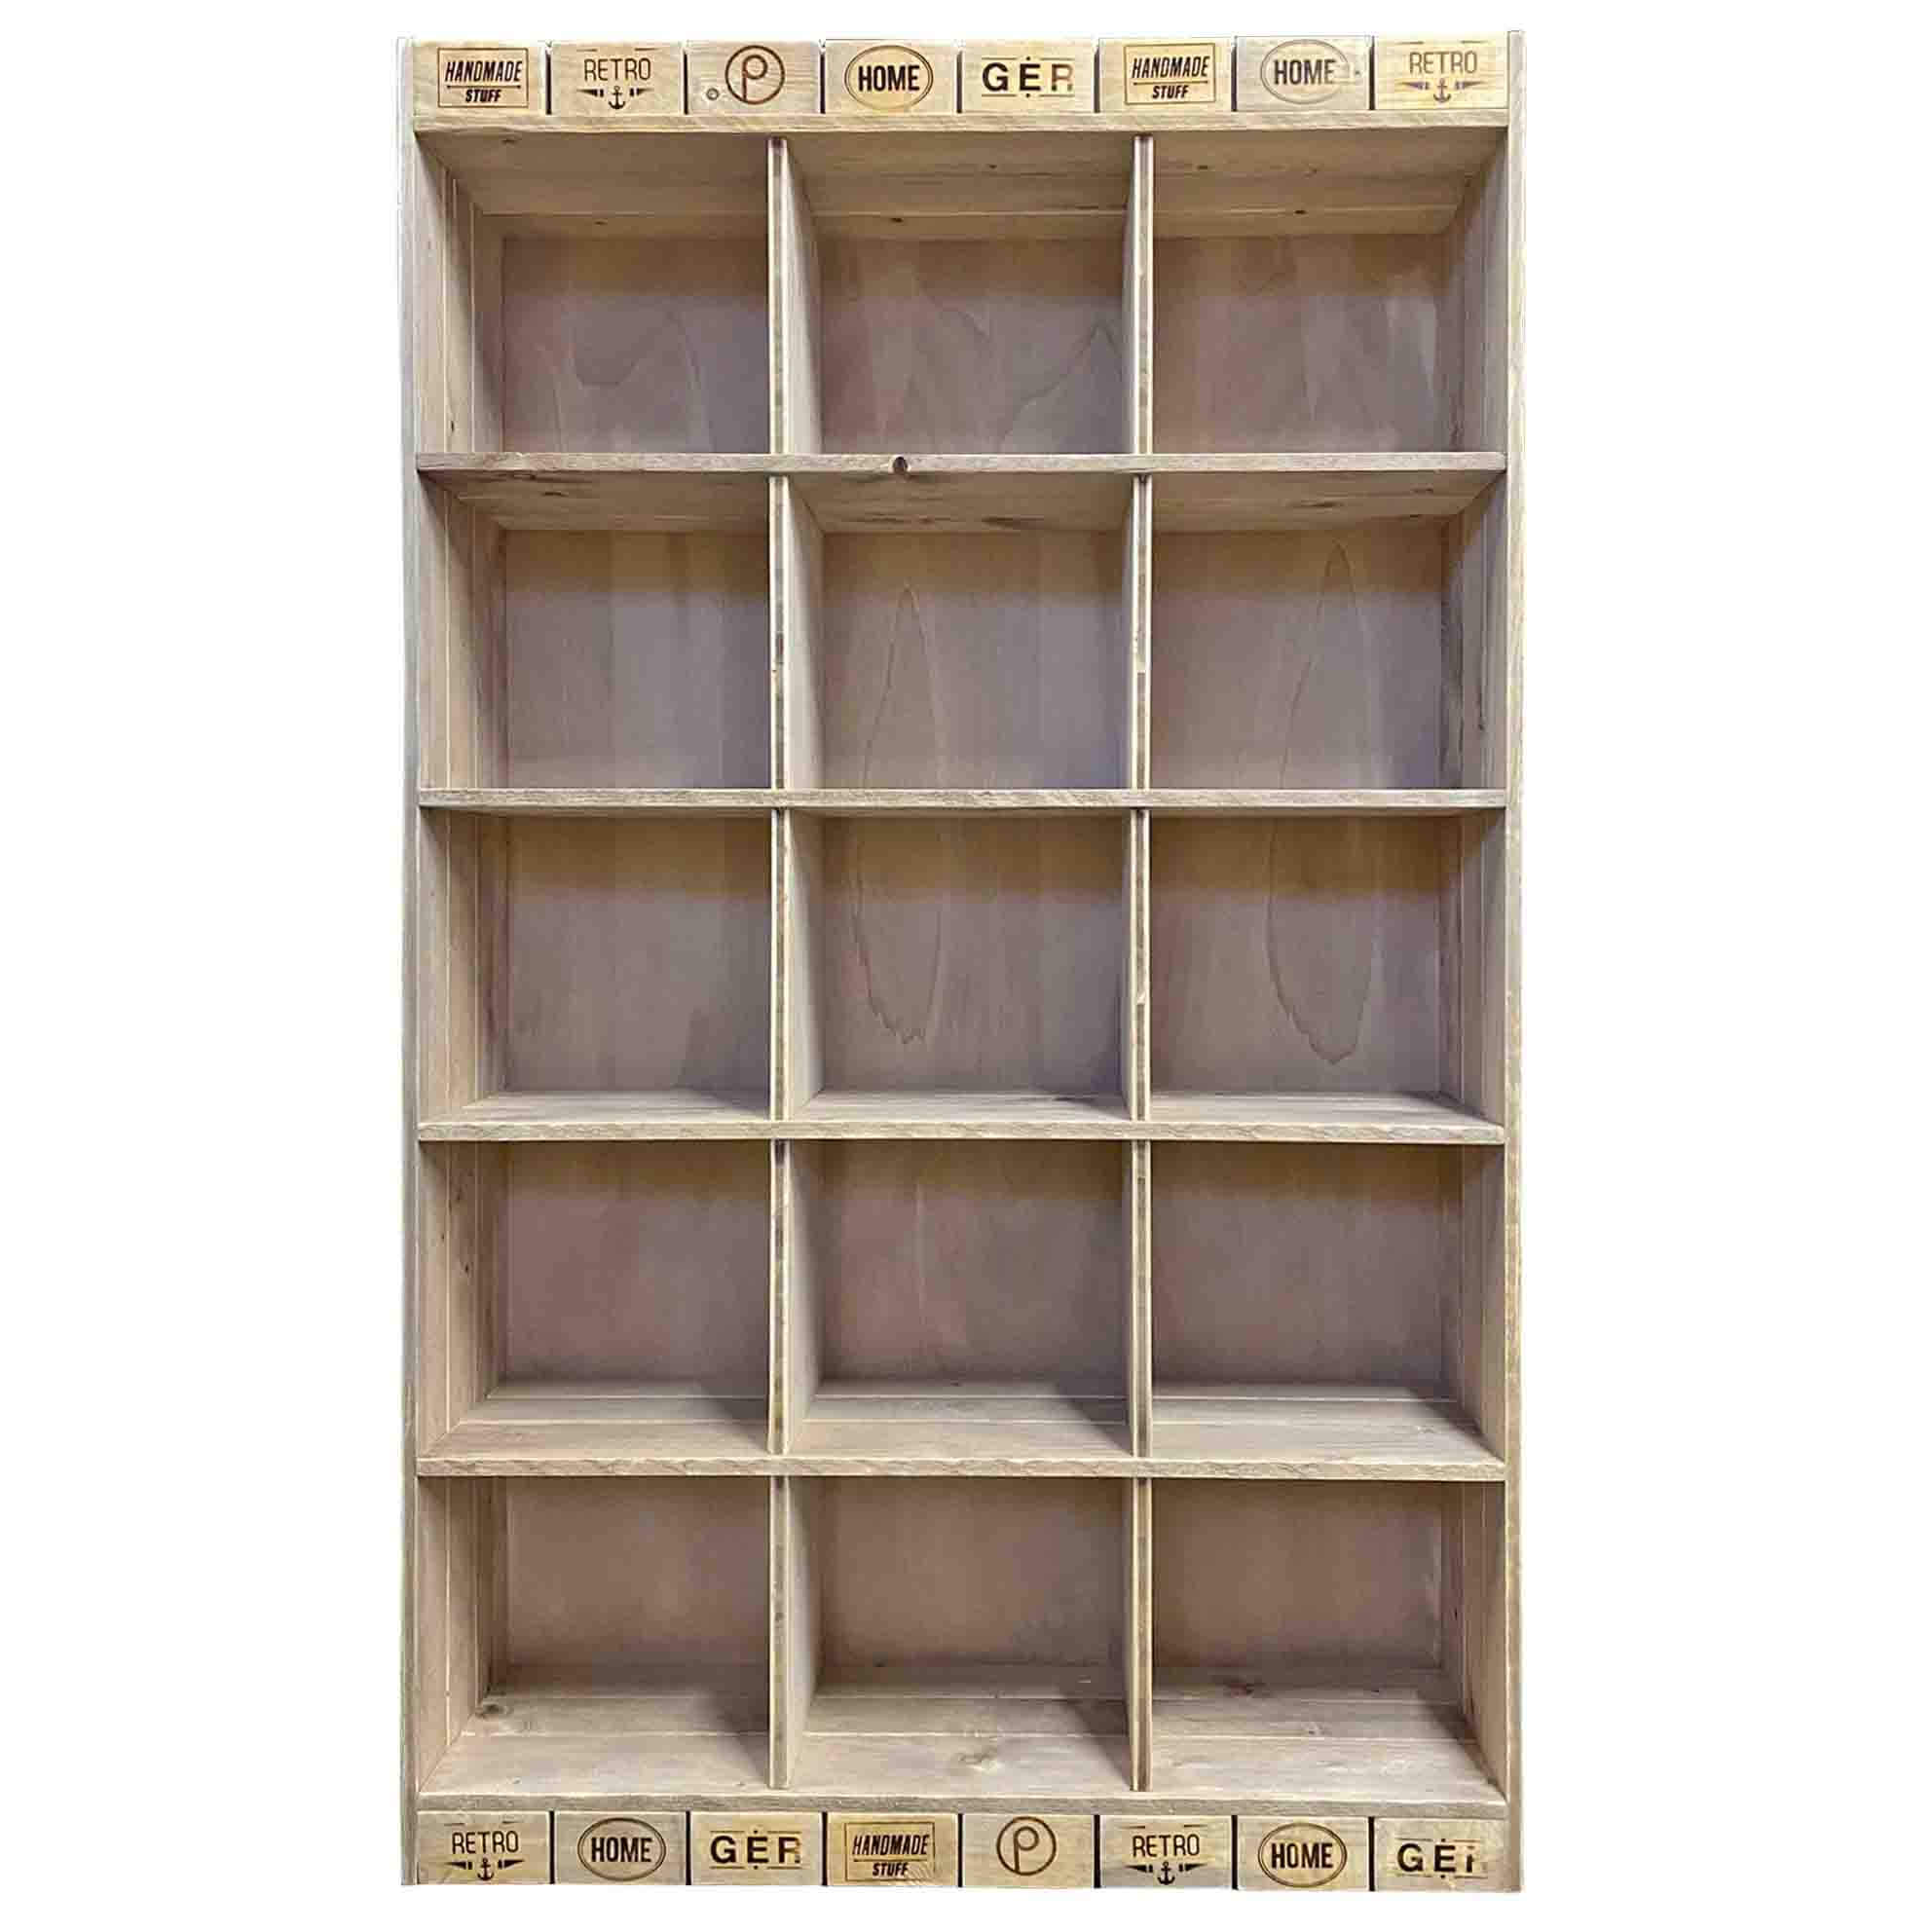 Wandregal-Palettenmöbel-Regal-Schrank aus Paletten